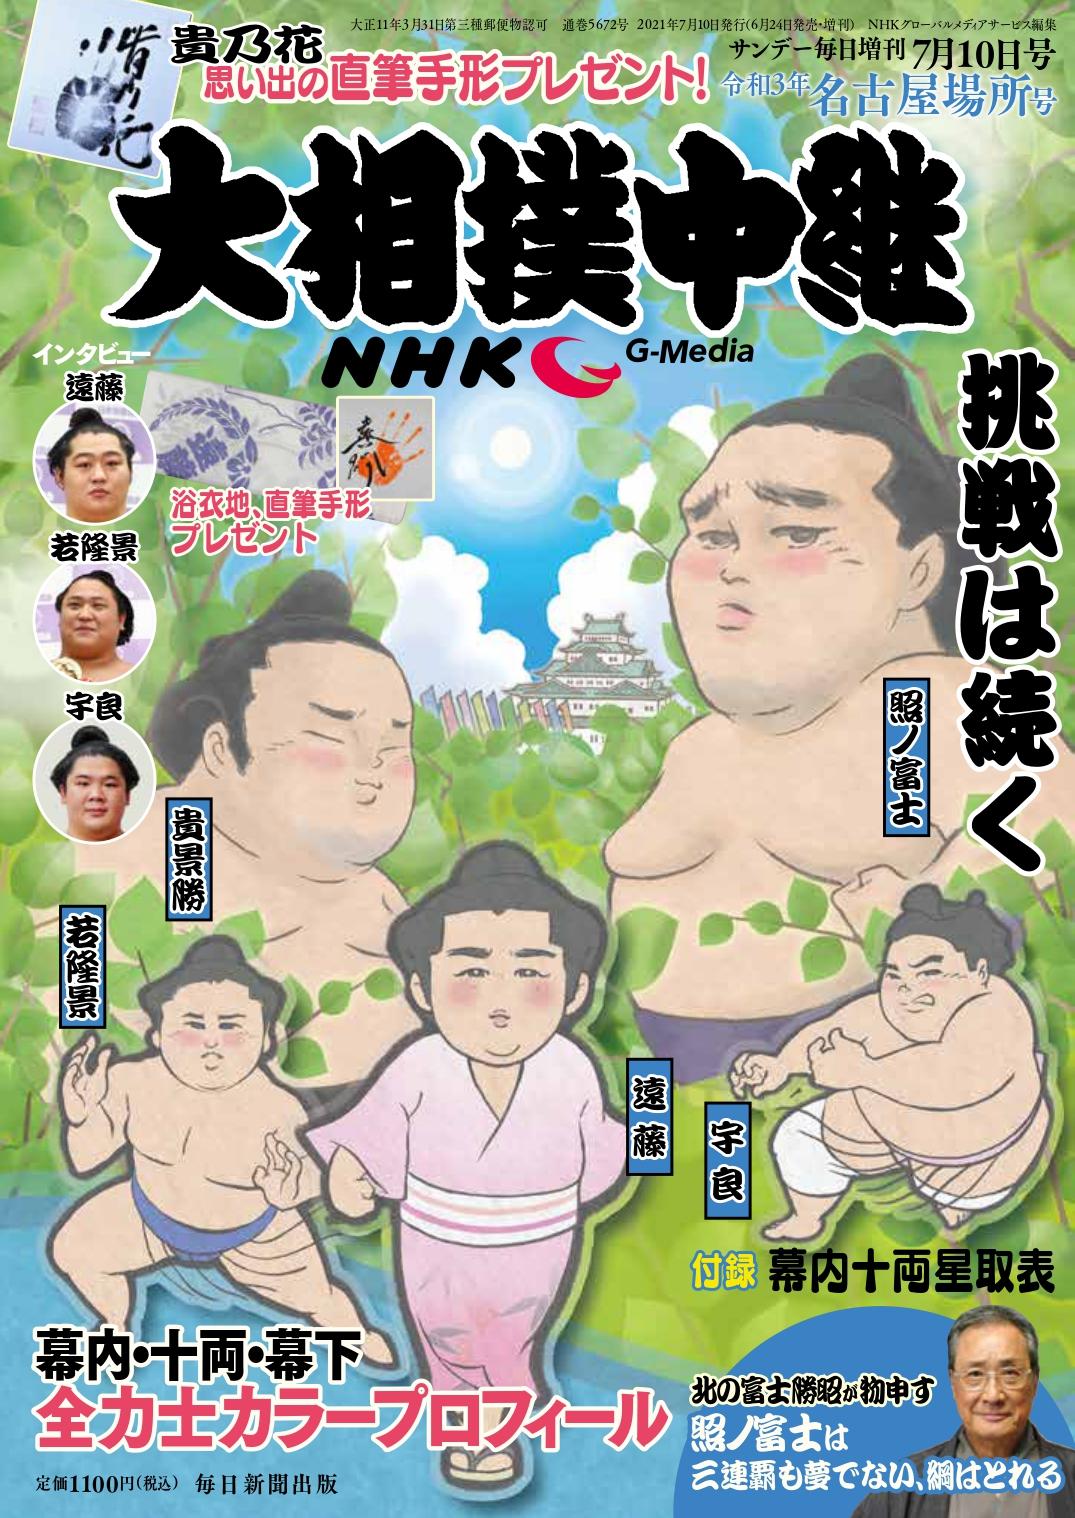 書影:大相撲中継 令和3年 名古屋場所号